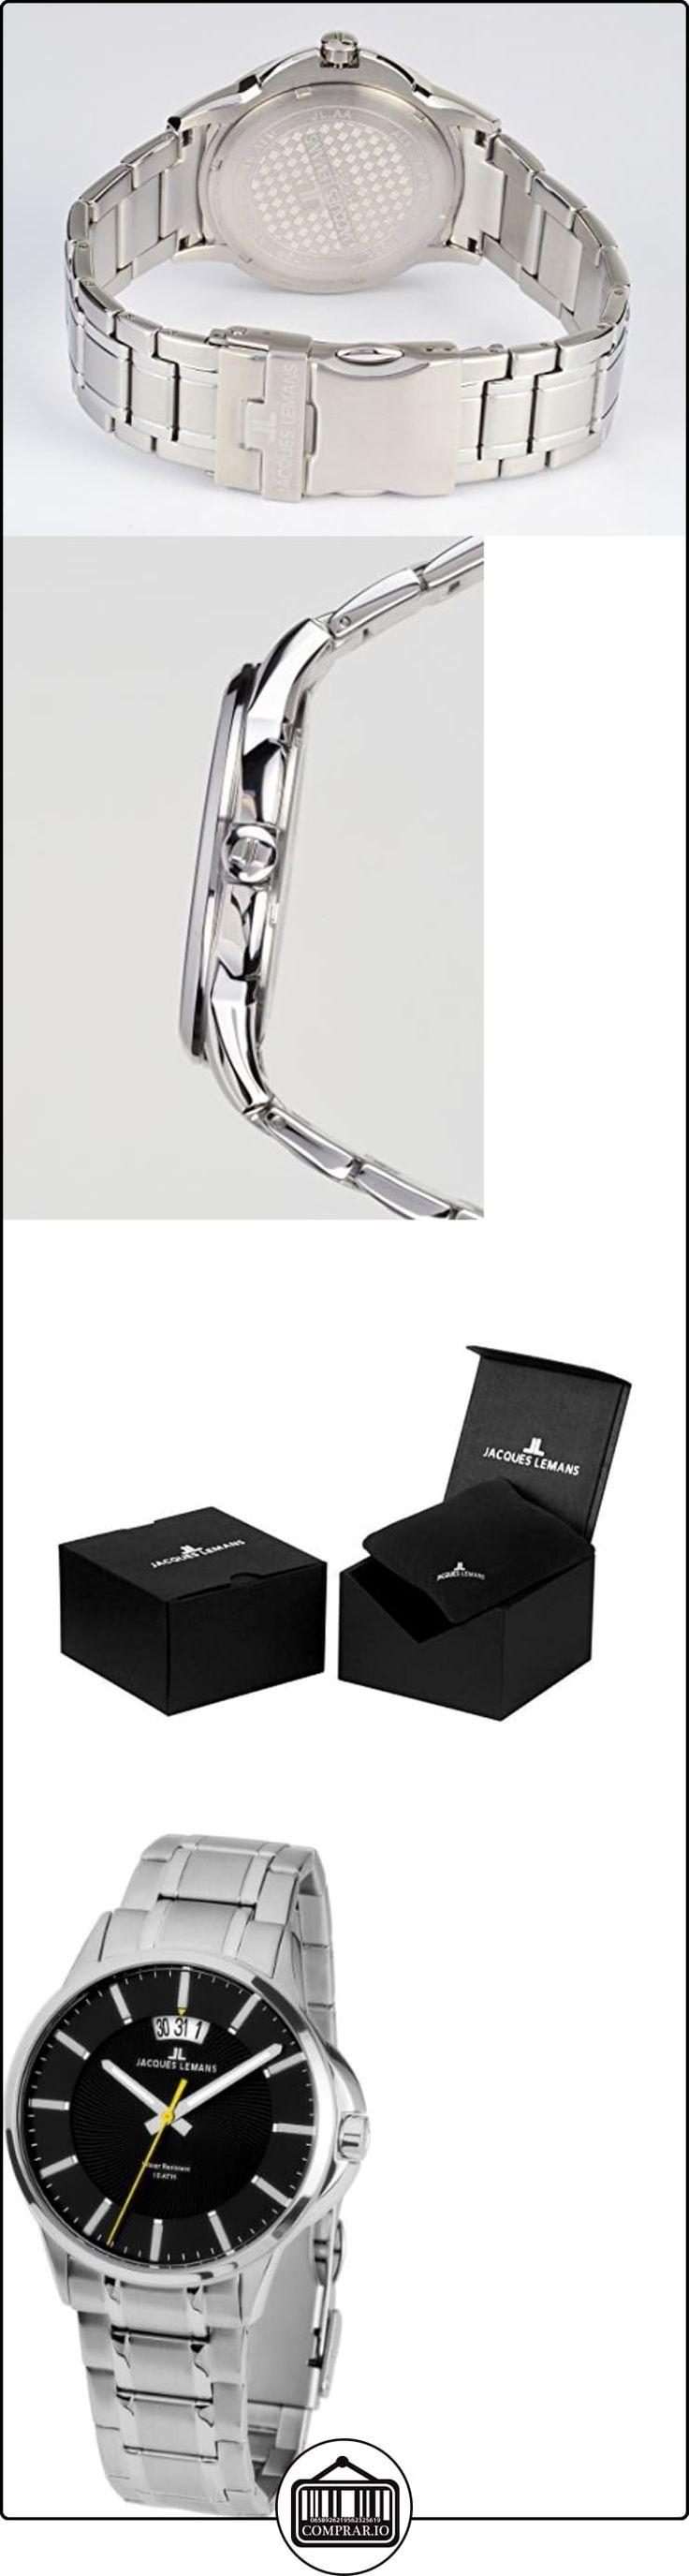 JACQUES LEMANS Sydney 1-1540D - Reloj de caballero de cuarzo, correa de acero inoxidable color plata  ✿ Relojes para hombre - (Gama media/alta) ✿